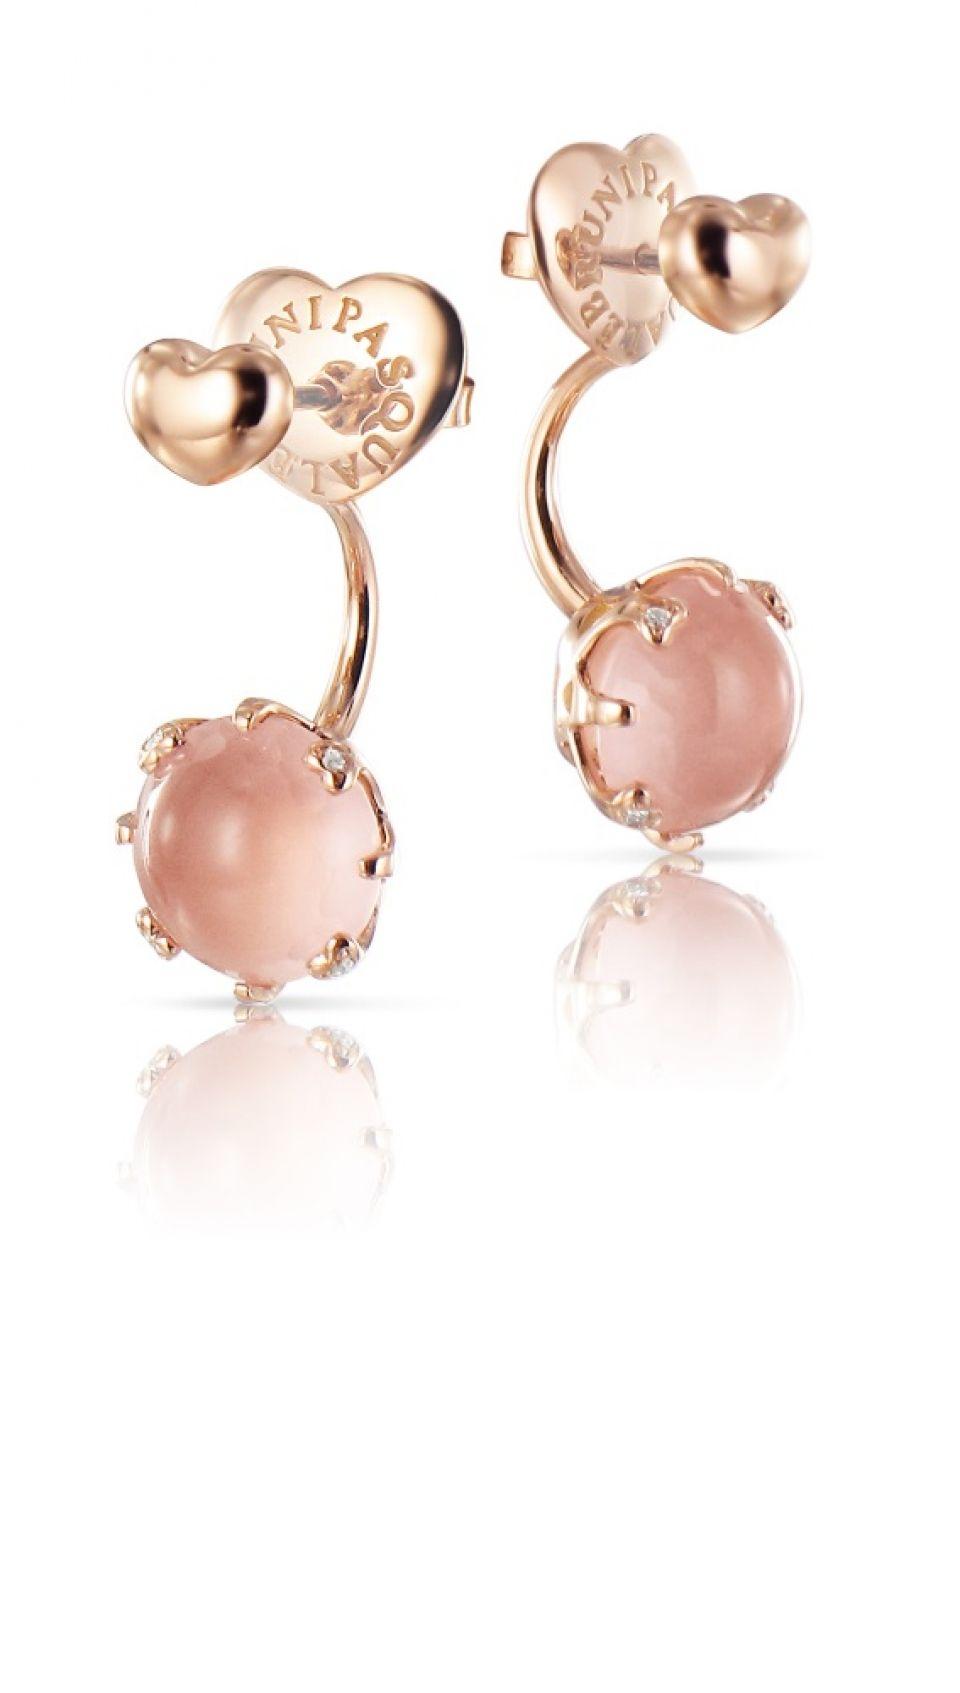 Pasquale Bruni Bon Ton Pink Quartz Flower Jacket Earrings in 18K Rose Gold 7FOHlnyE